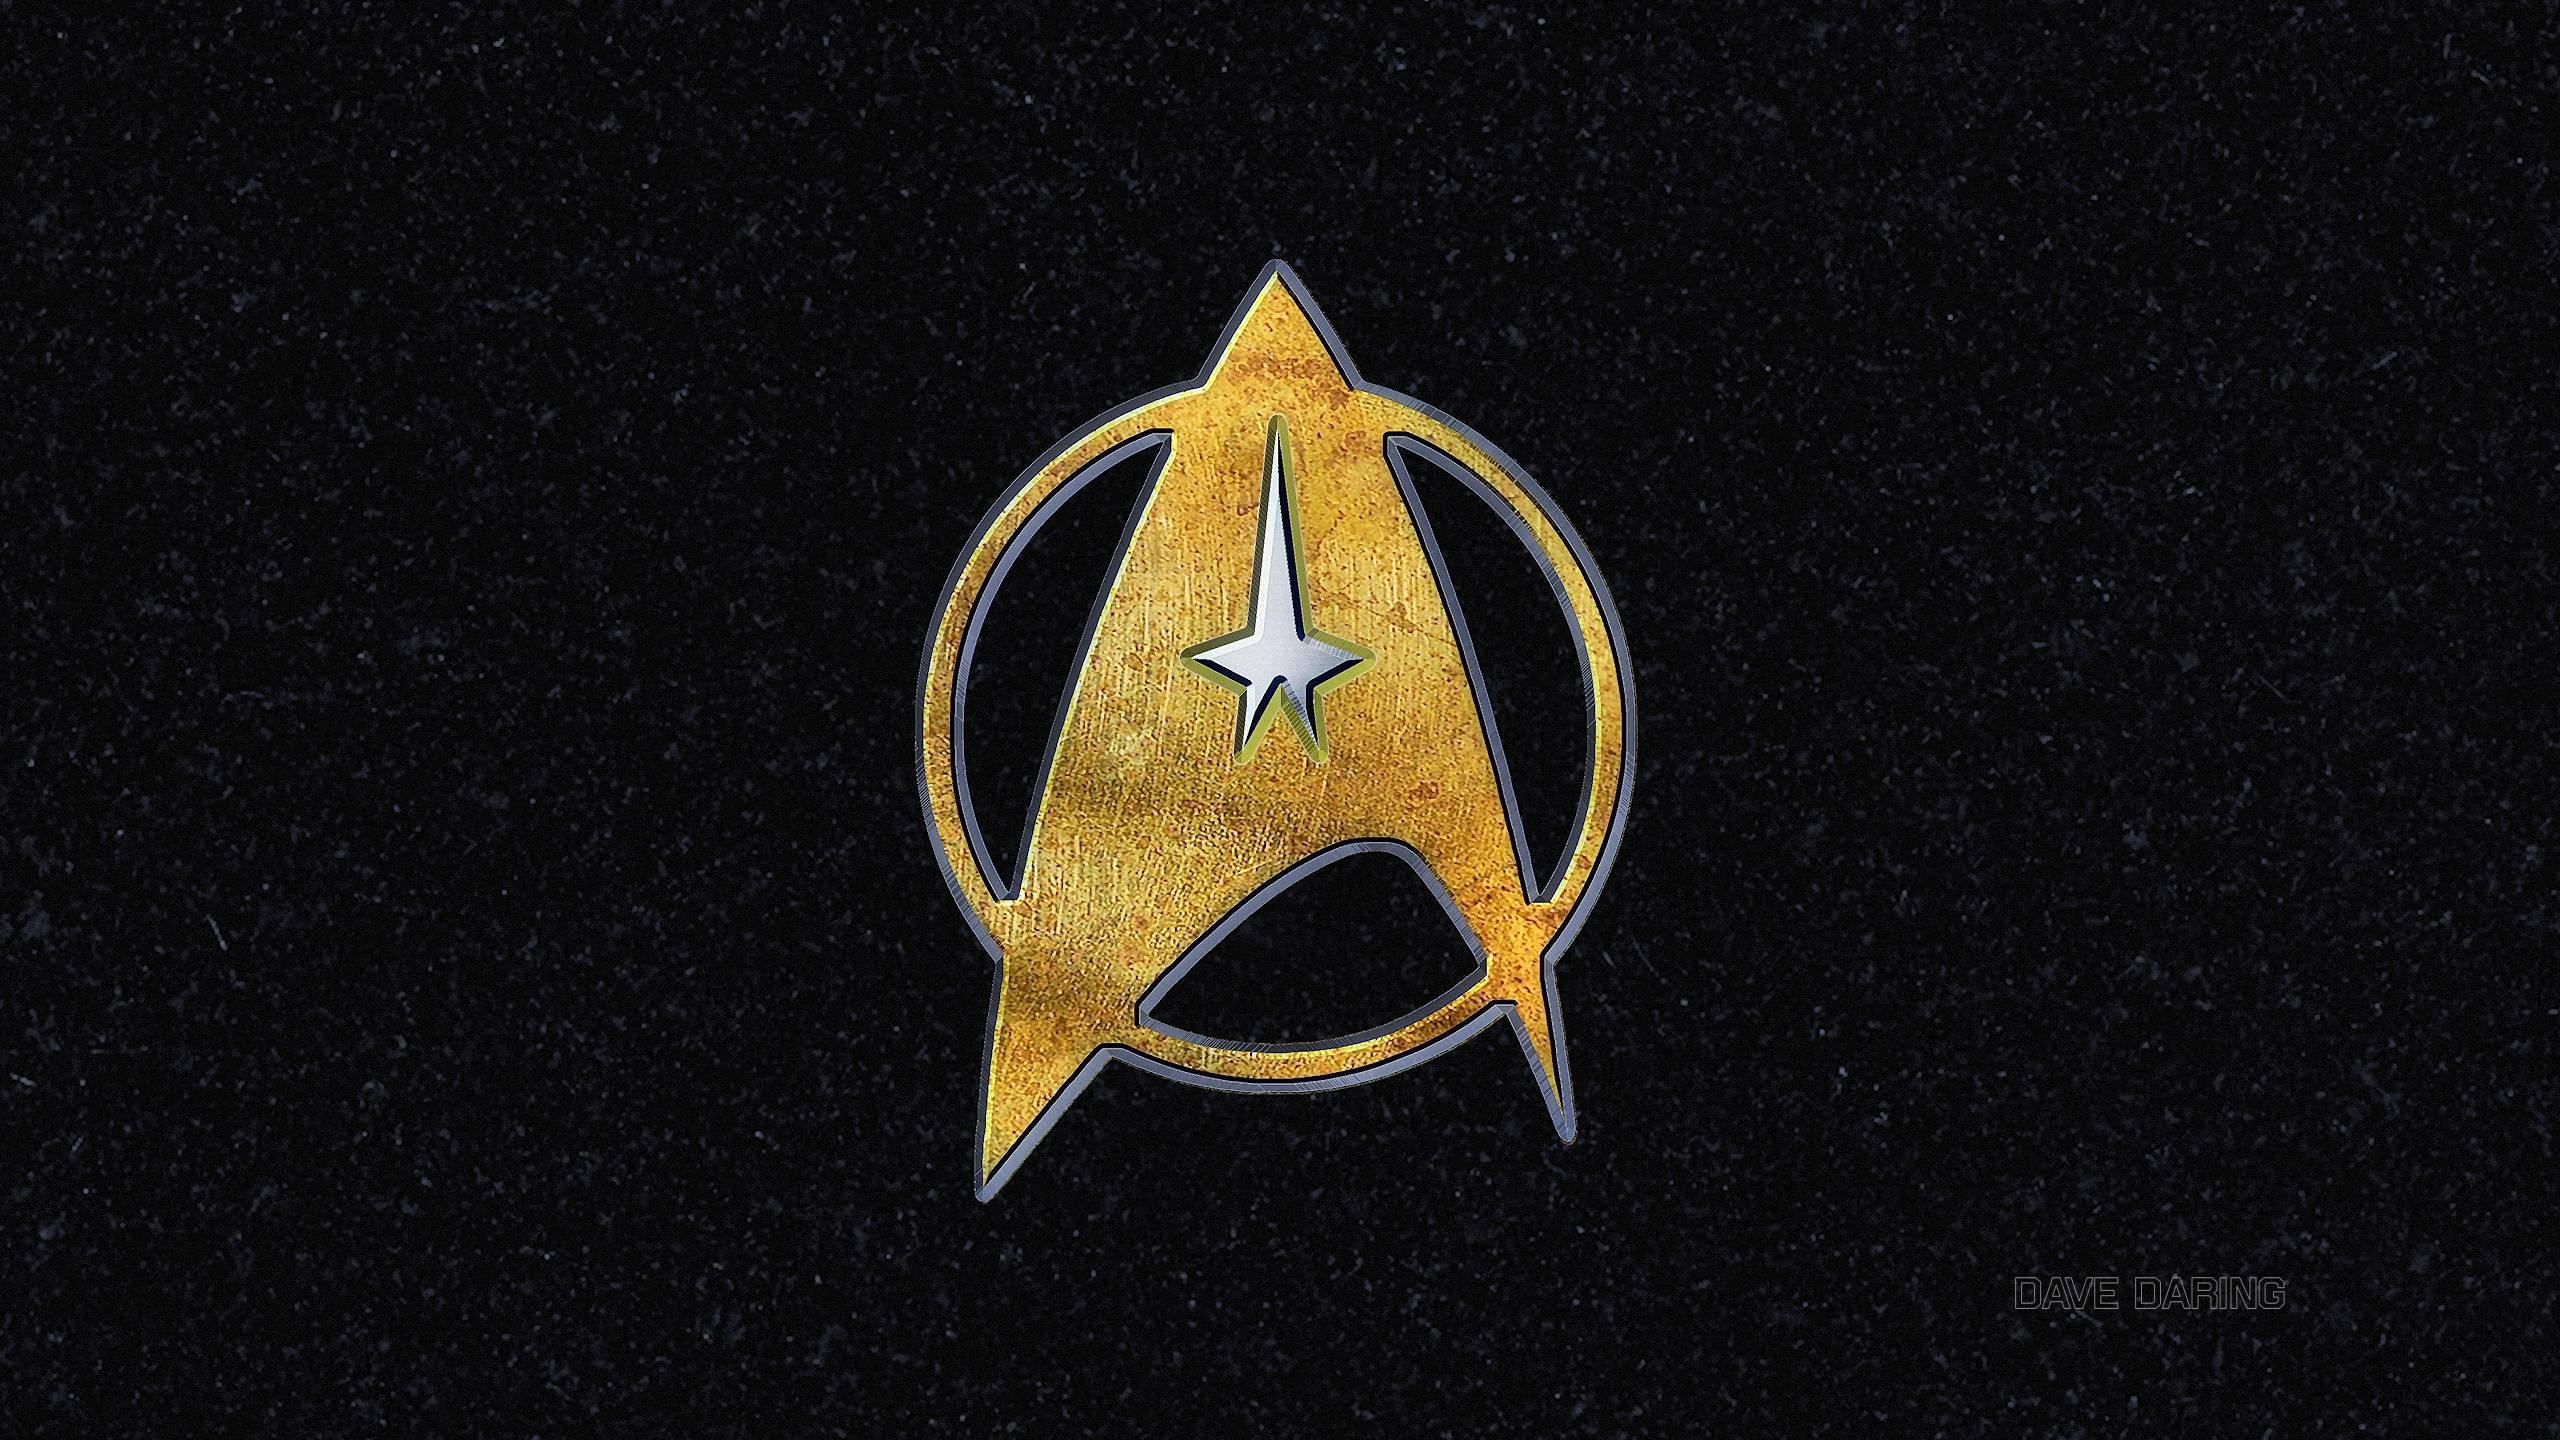 Star trek symbol in brass silver and black granite by dave - Star trek symbol wallpaper ...